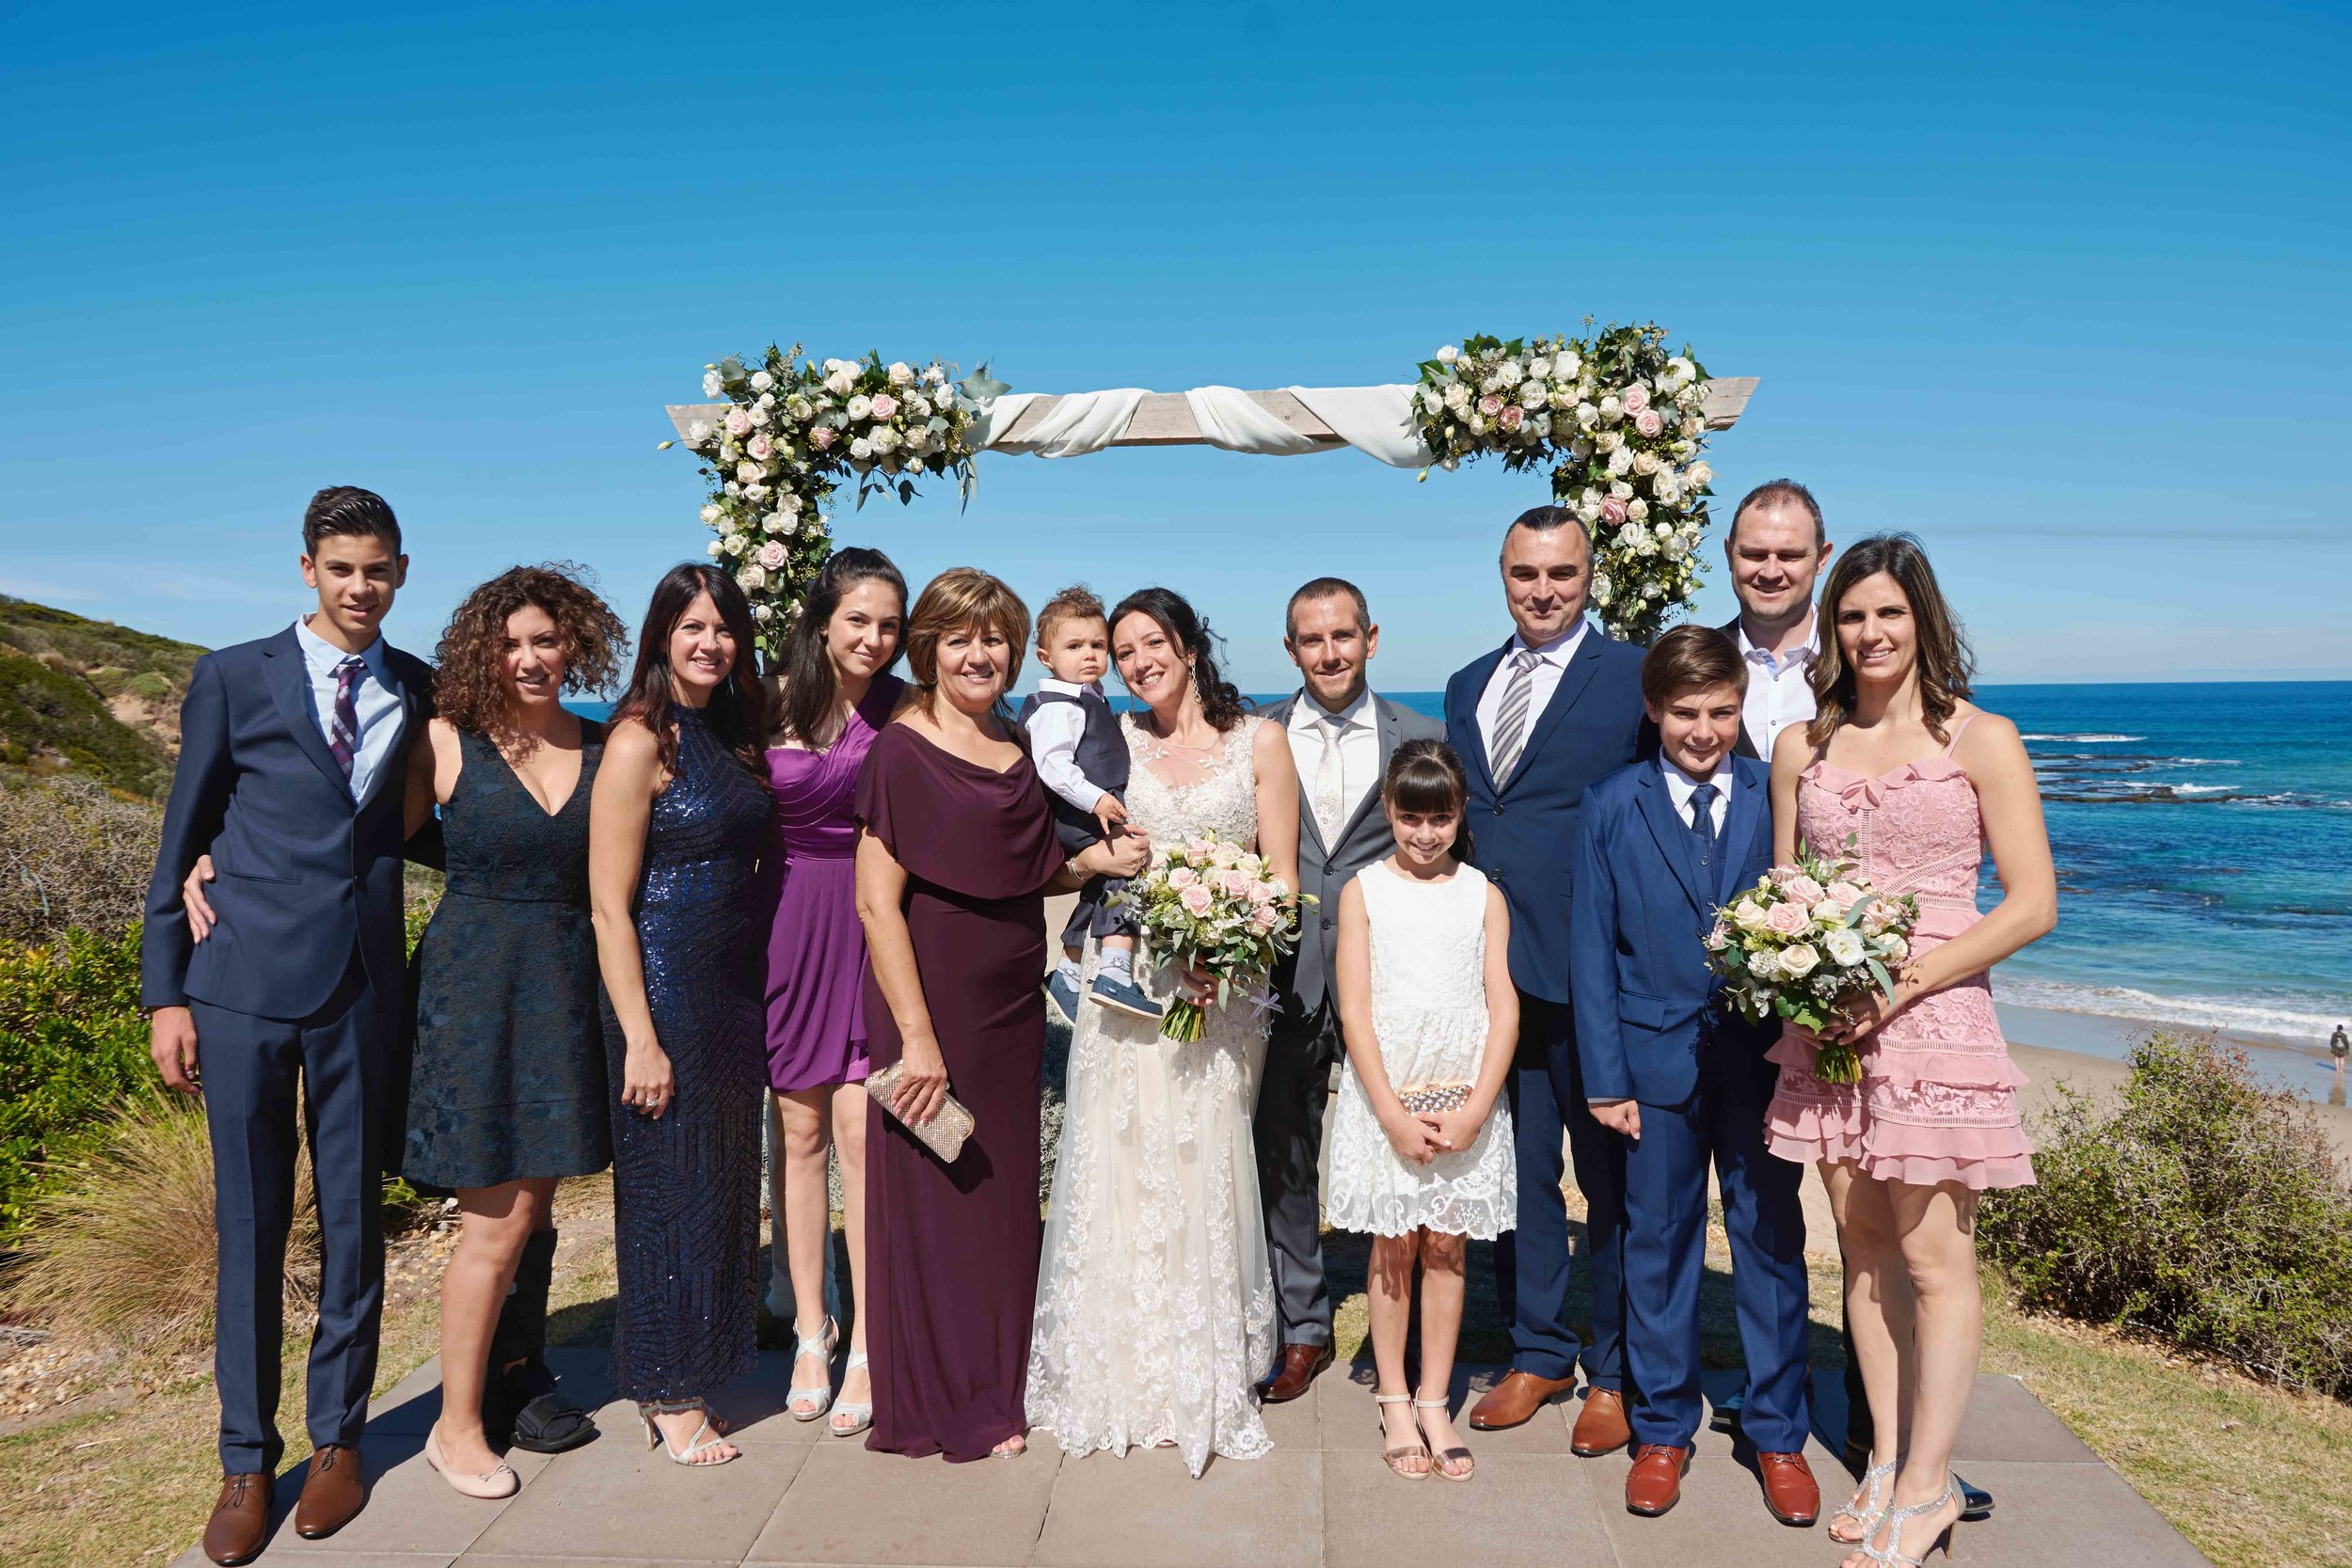 sorrento-wedding-photography-all-smiles-marissa-jade-photography-62.jpg